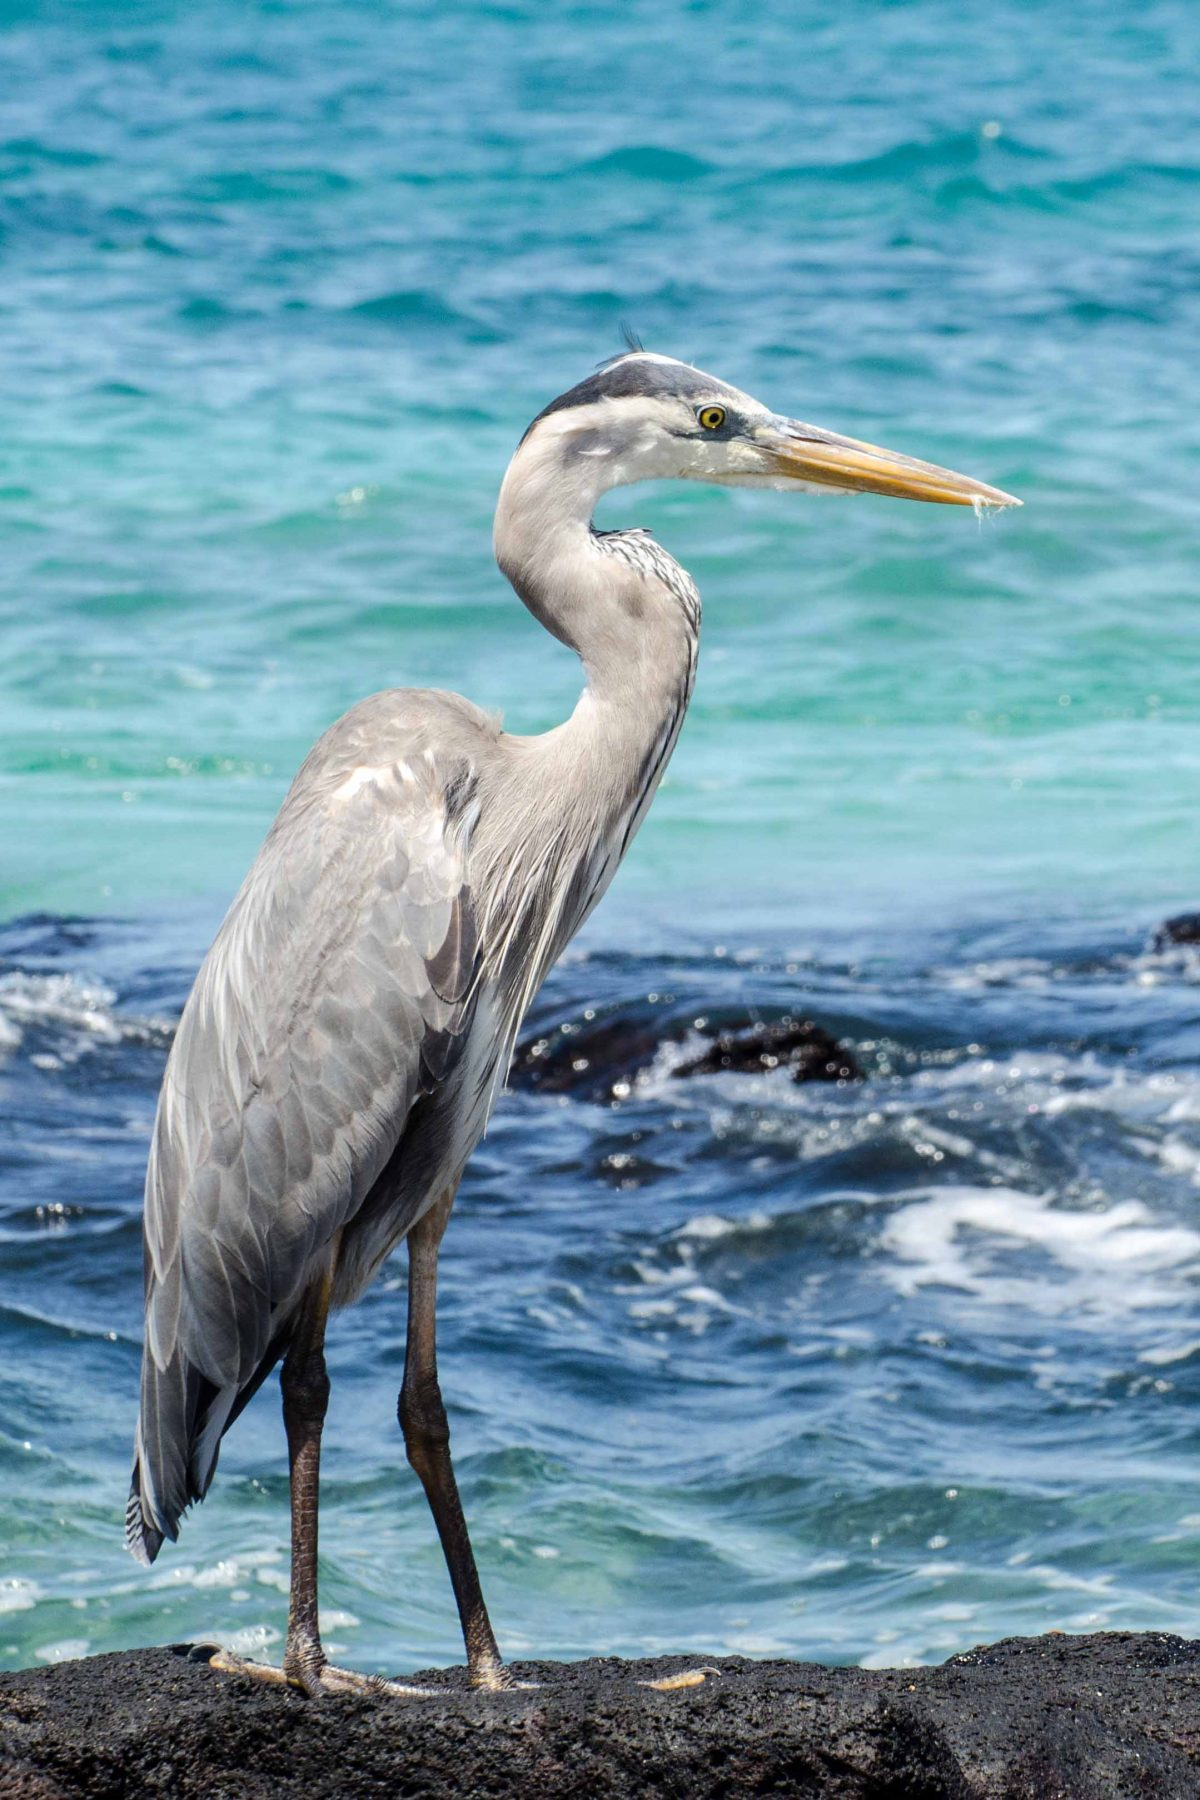 Great Blue Heron, San Cristobal Island, the Galapagos, Ecuador   ©Angie Drake